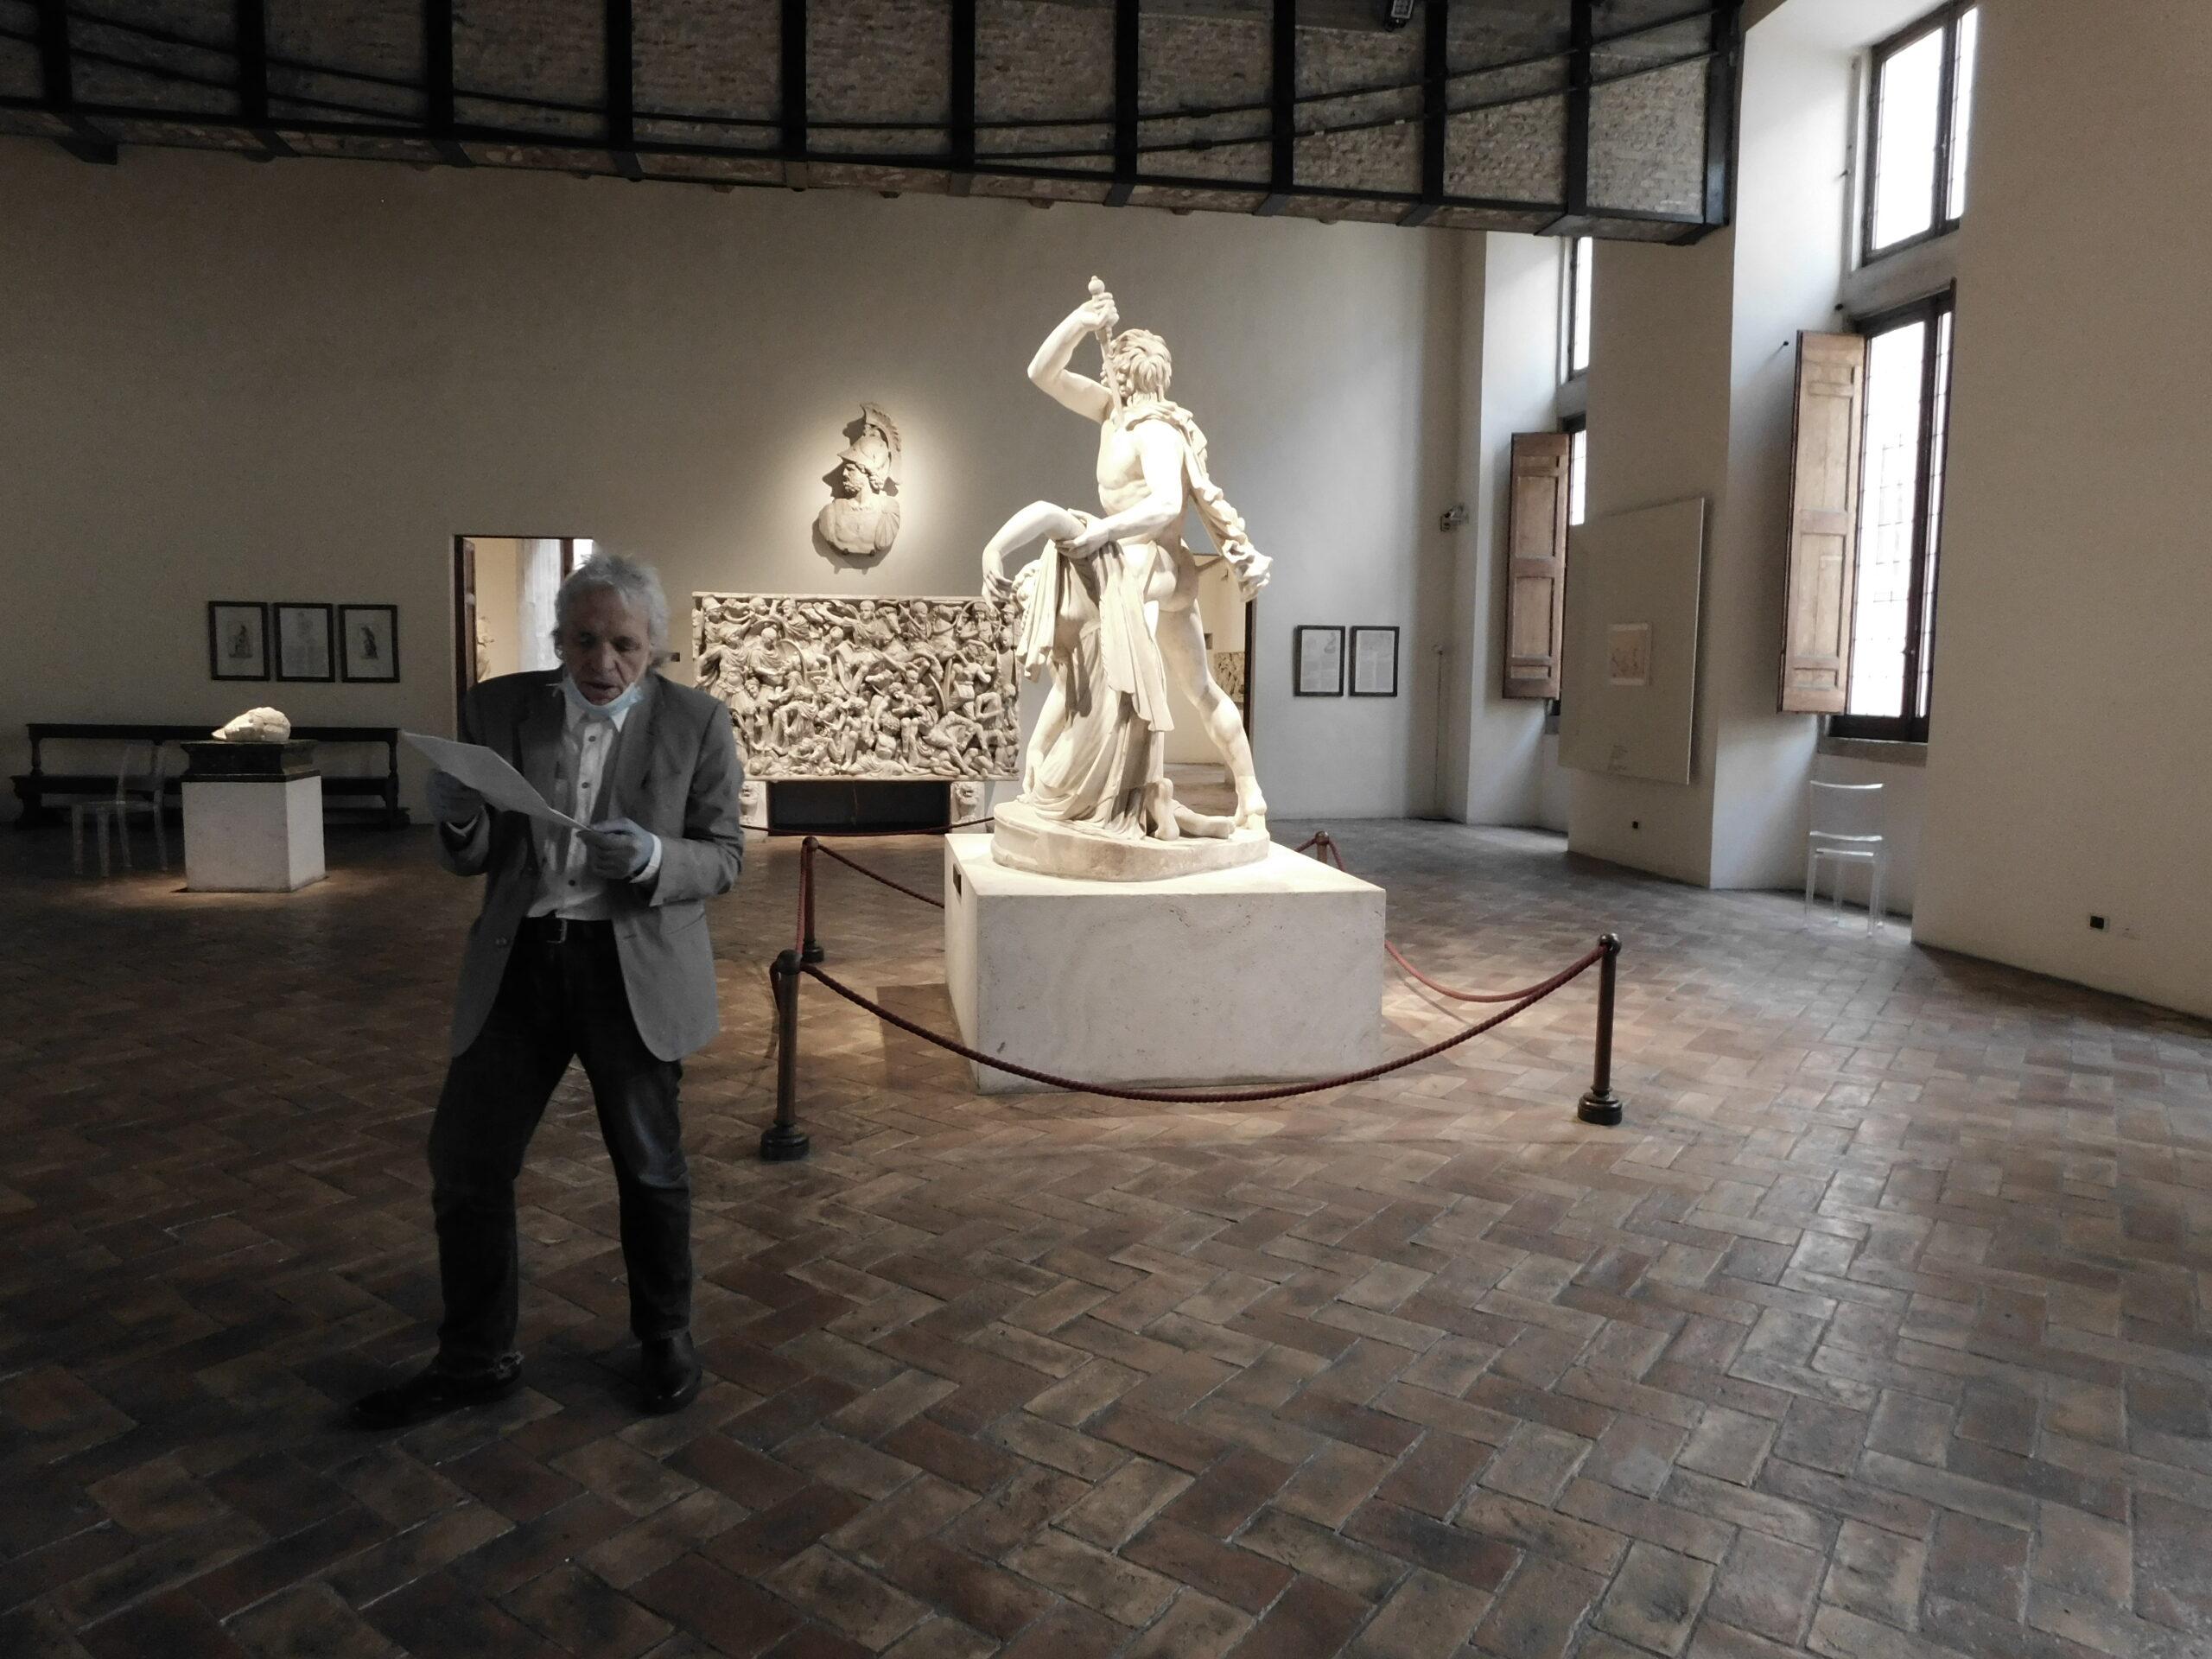 Abel Ferrara interpreta il Galata Suicida. A Roma l'intensa performance dai versi di Gabriele Tinti